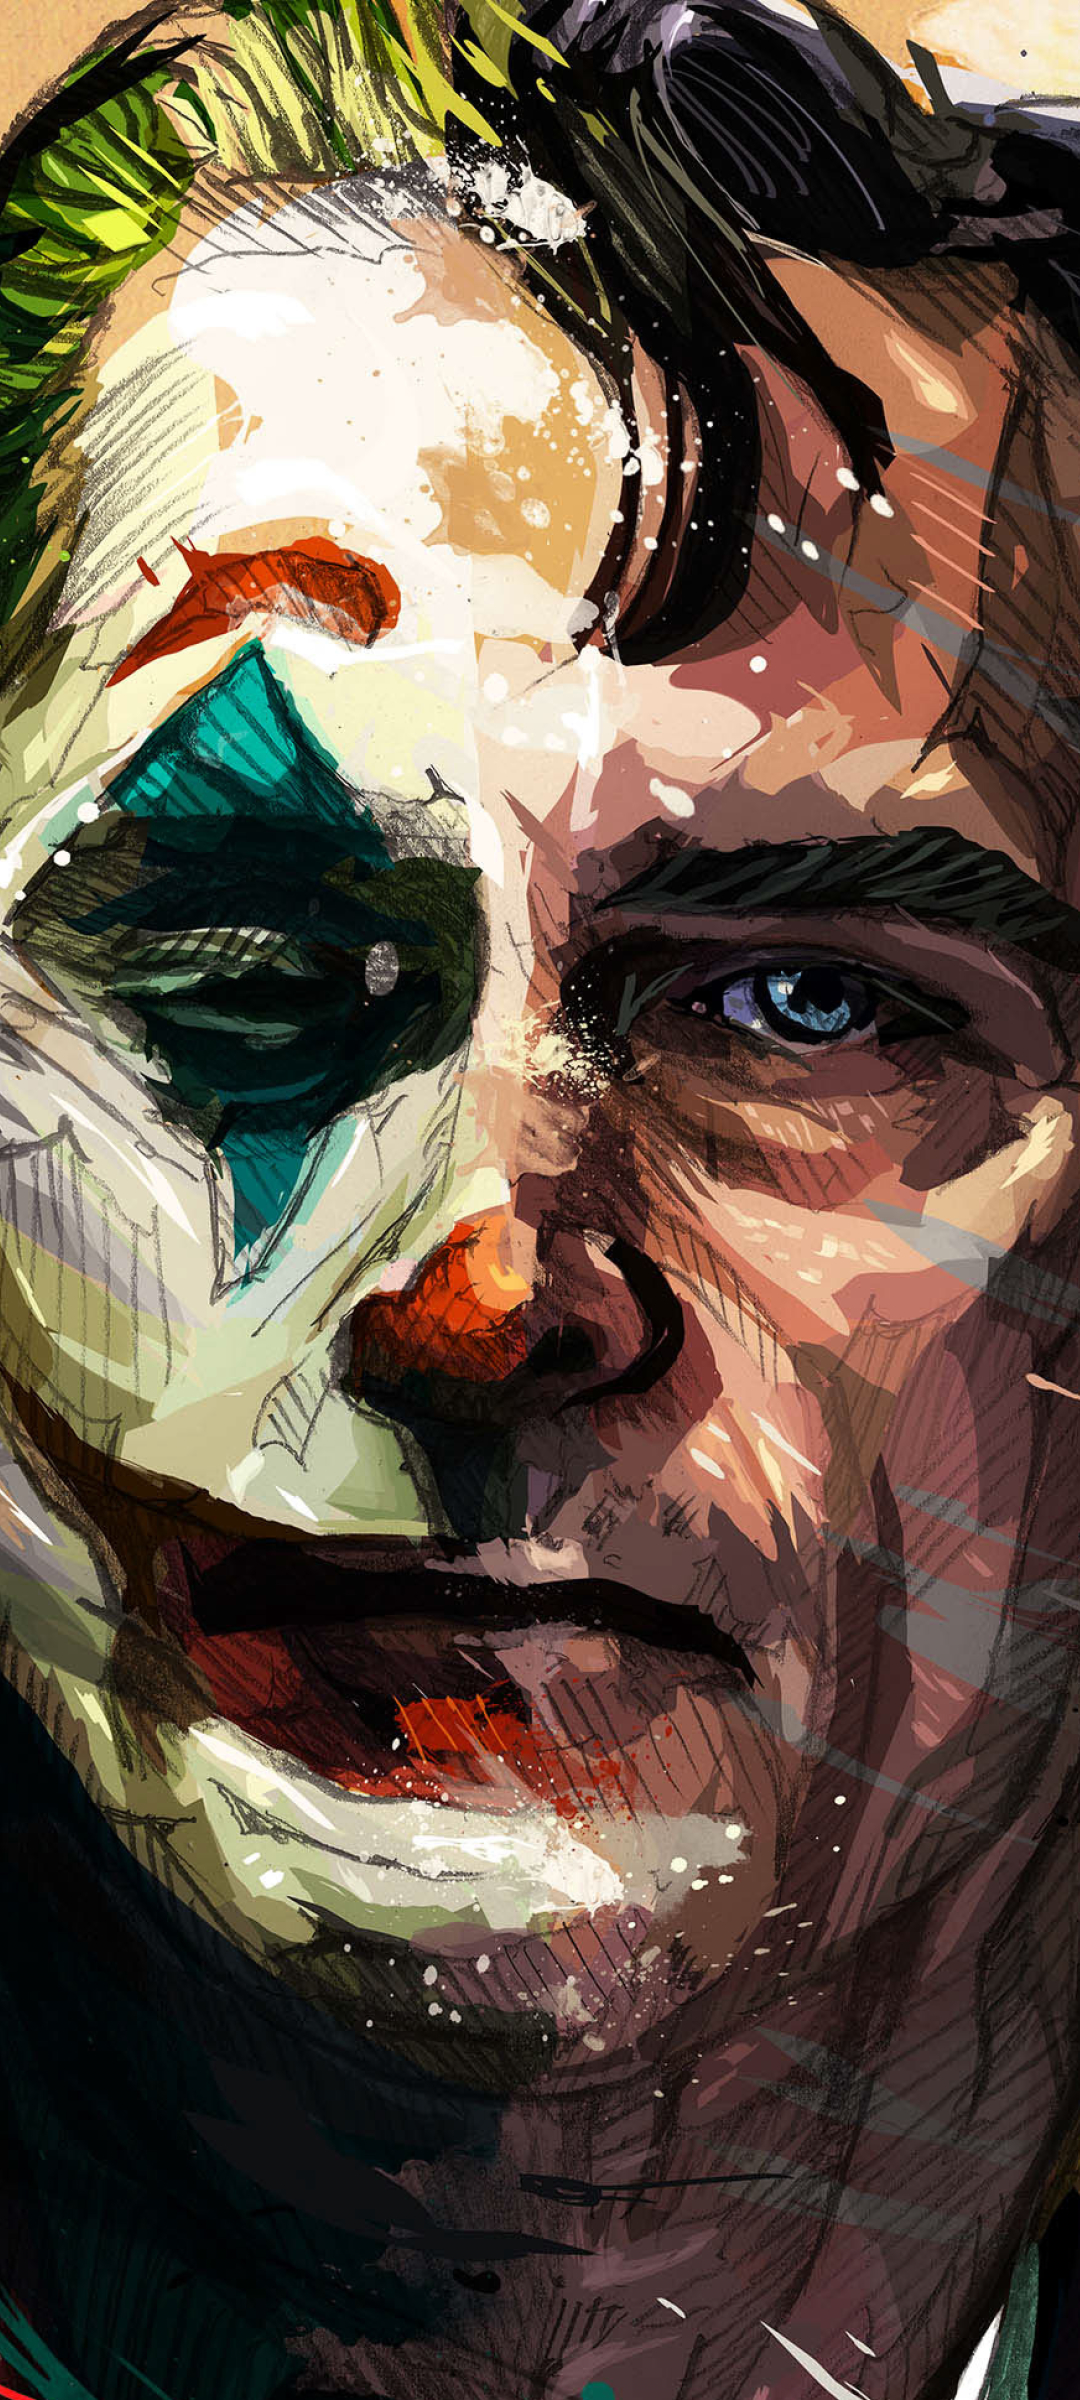 1080x2400 Joaquin Phoenix Joker Artistic 1080x2400 Resolution